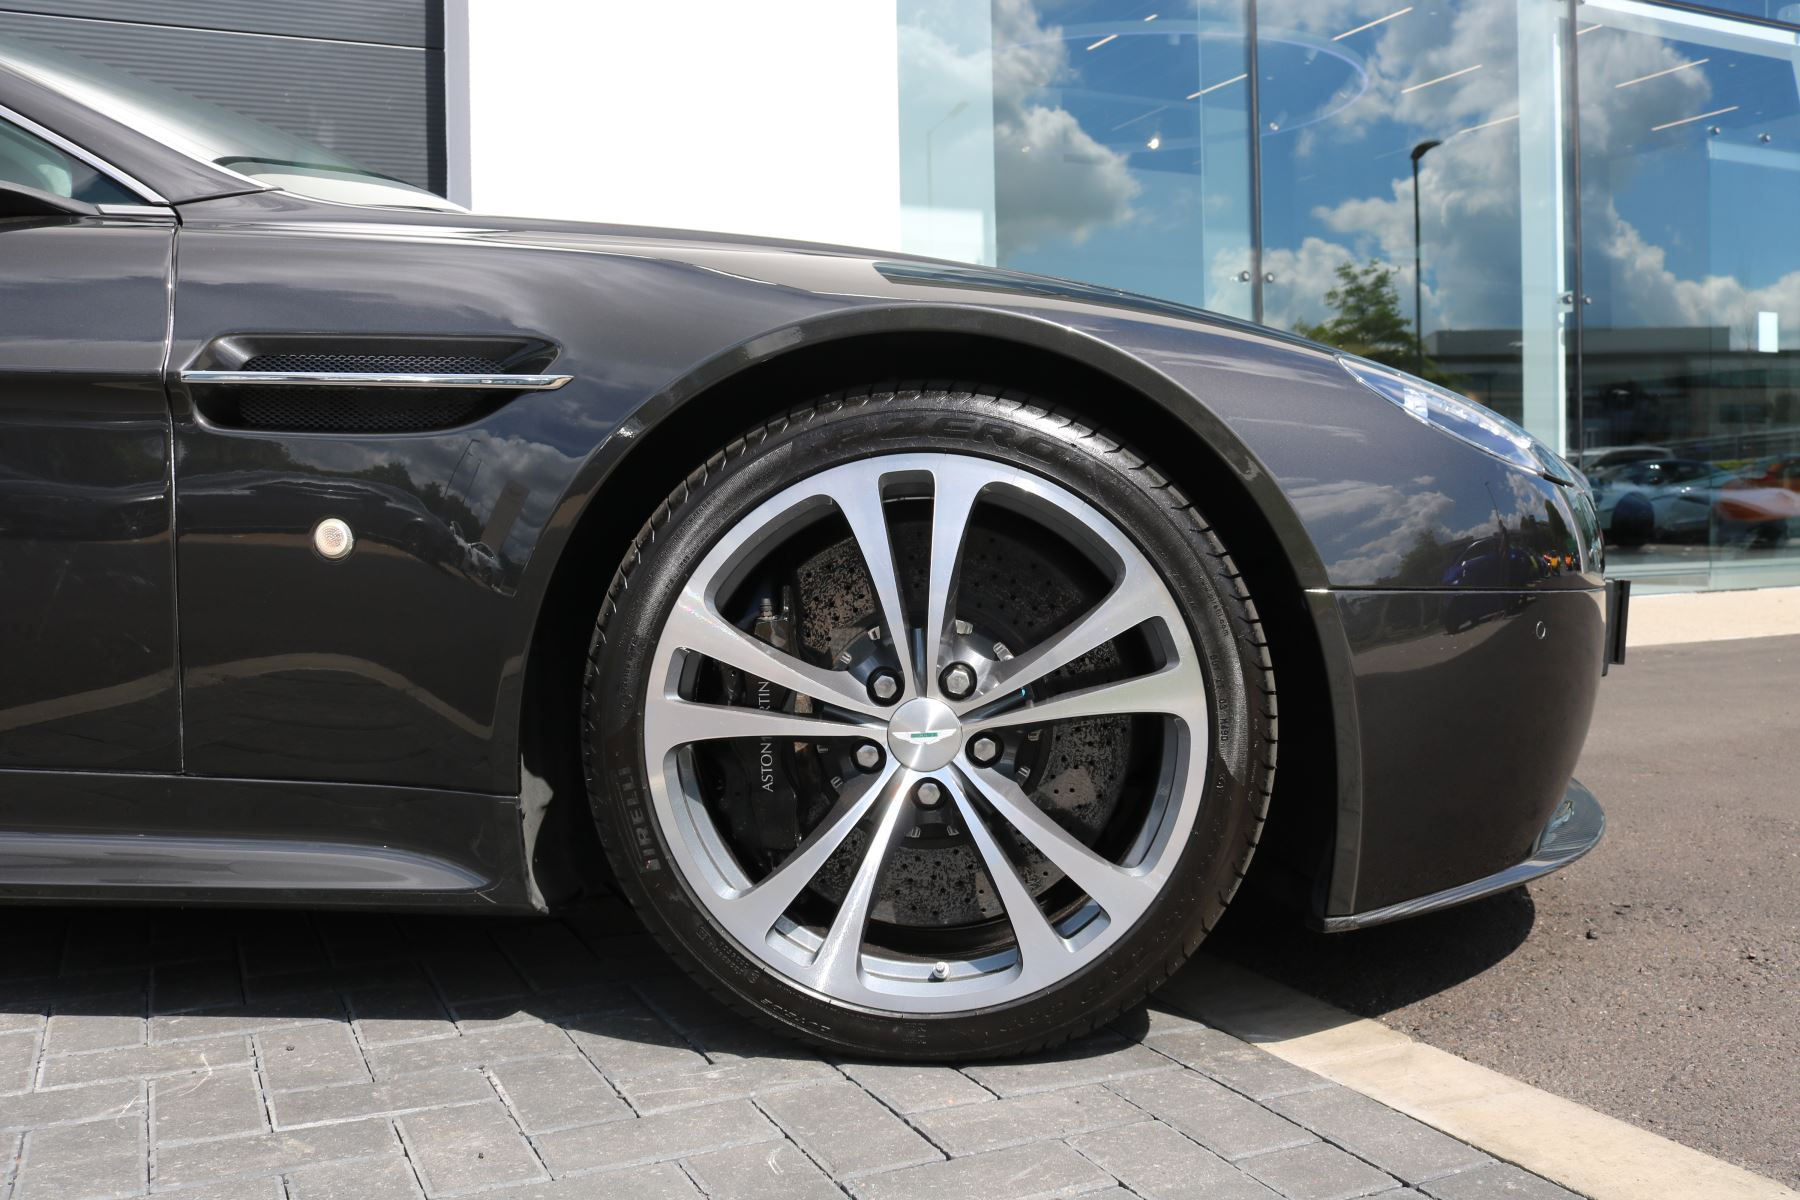 Aston Martin V12 Vantage 2dr image 9